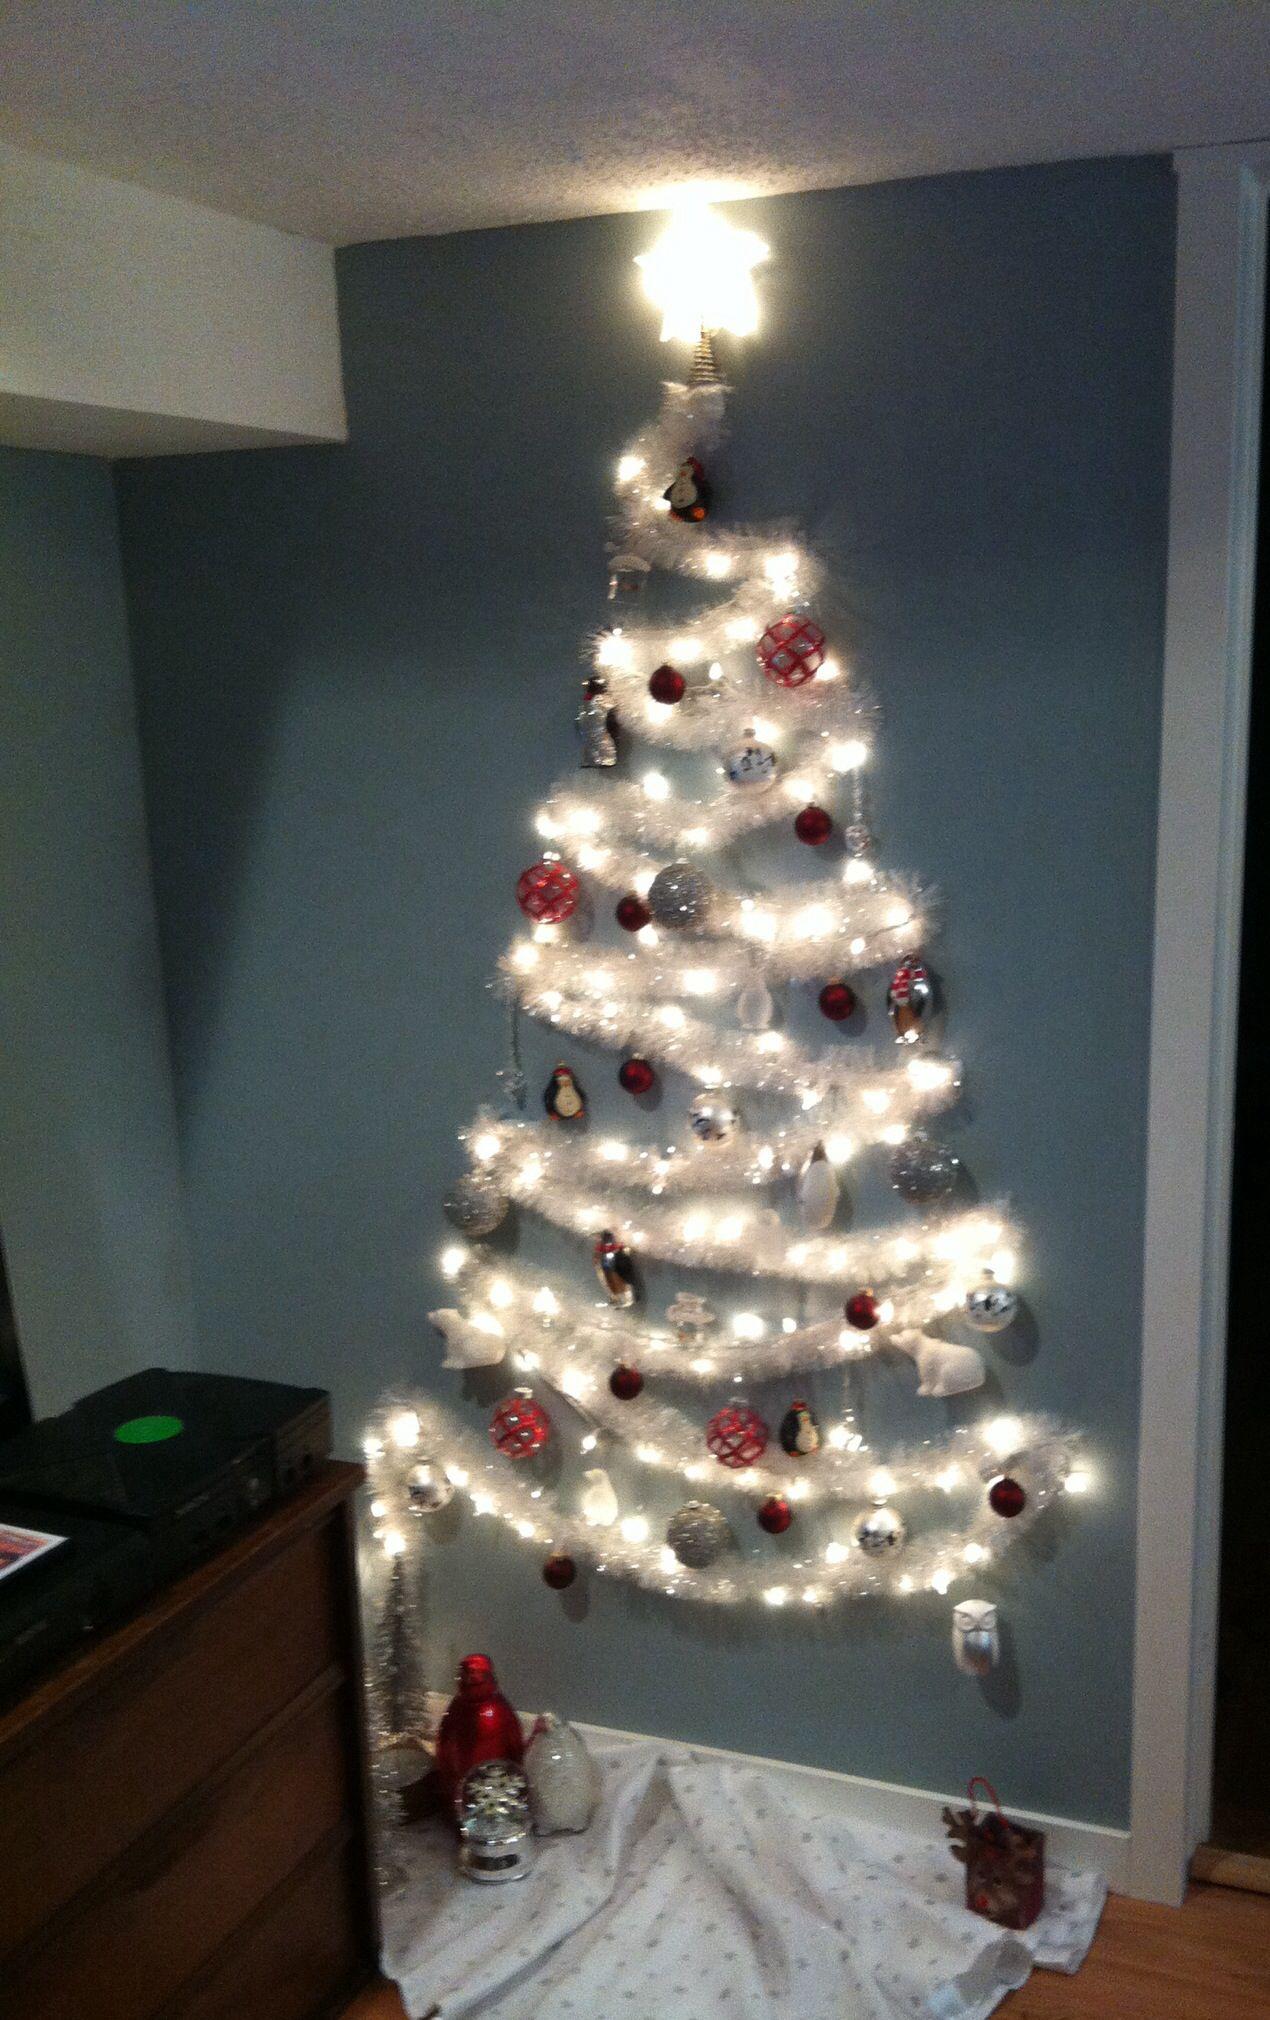 The No Tree Christmas Tree Wall Christmas Tree